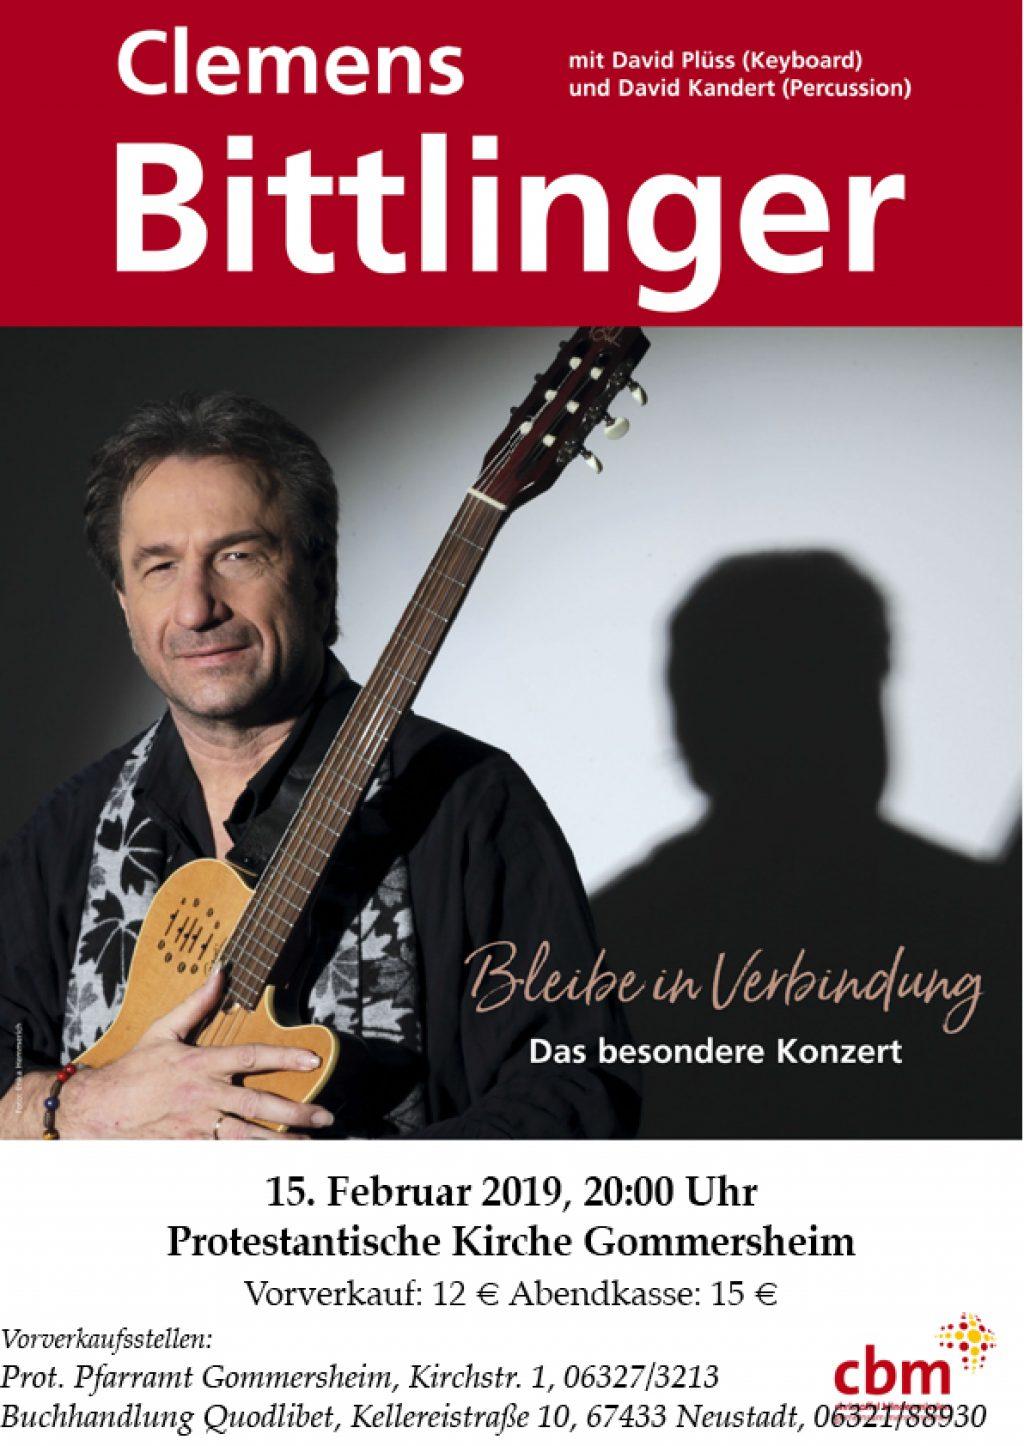 Clemens-Bittlinger-Konzert